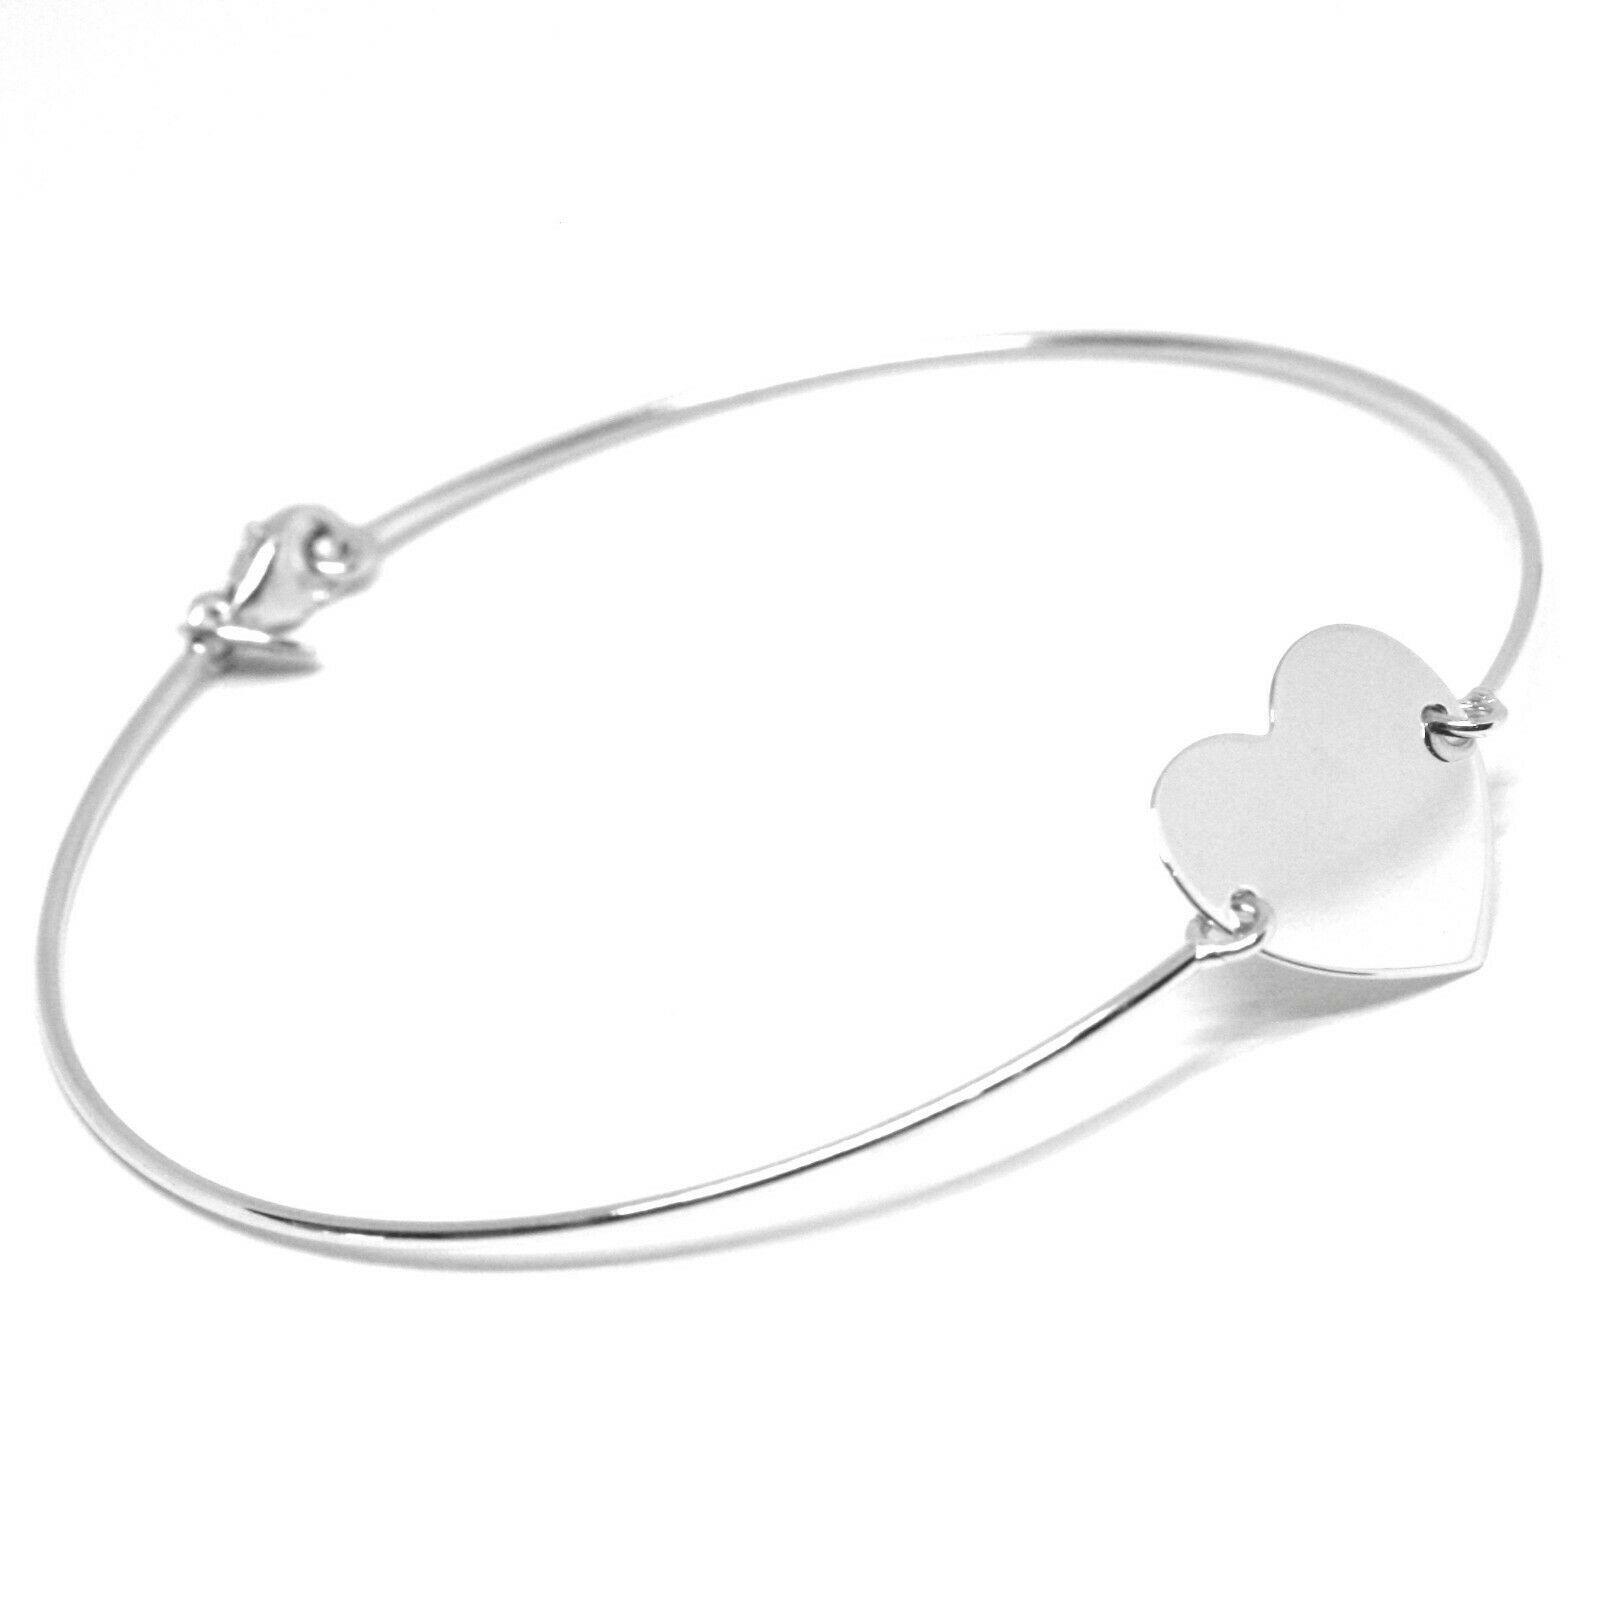 Mini Bracelet Yellow or White Gold 750 18K, Semi Rigid, Heart Centre Plate